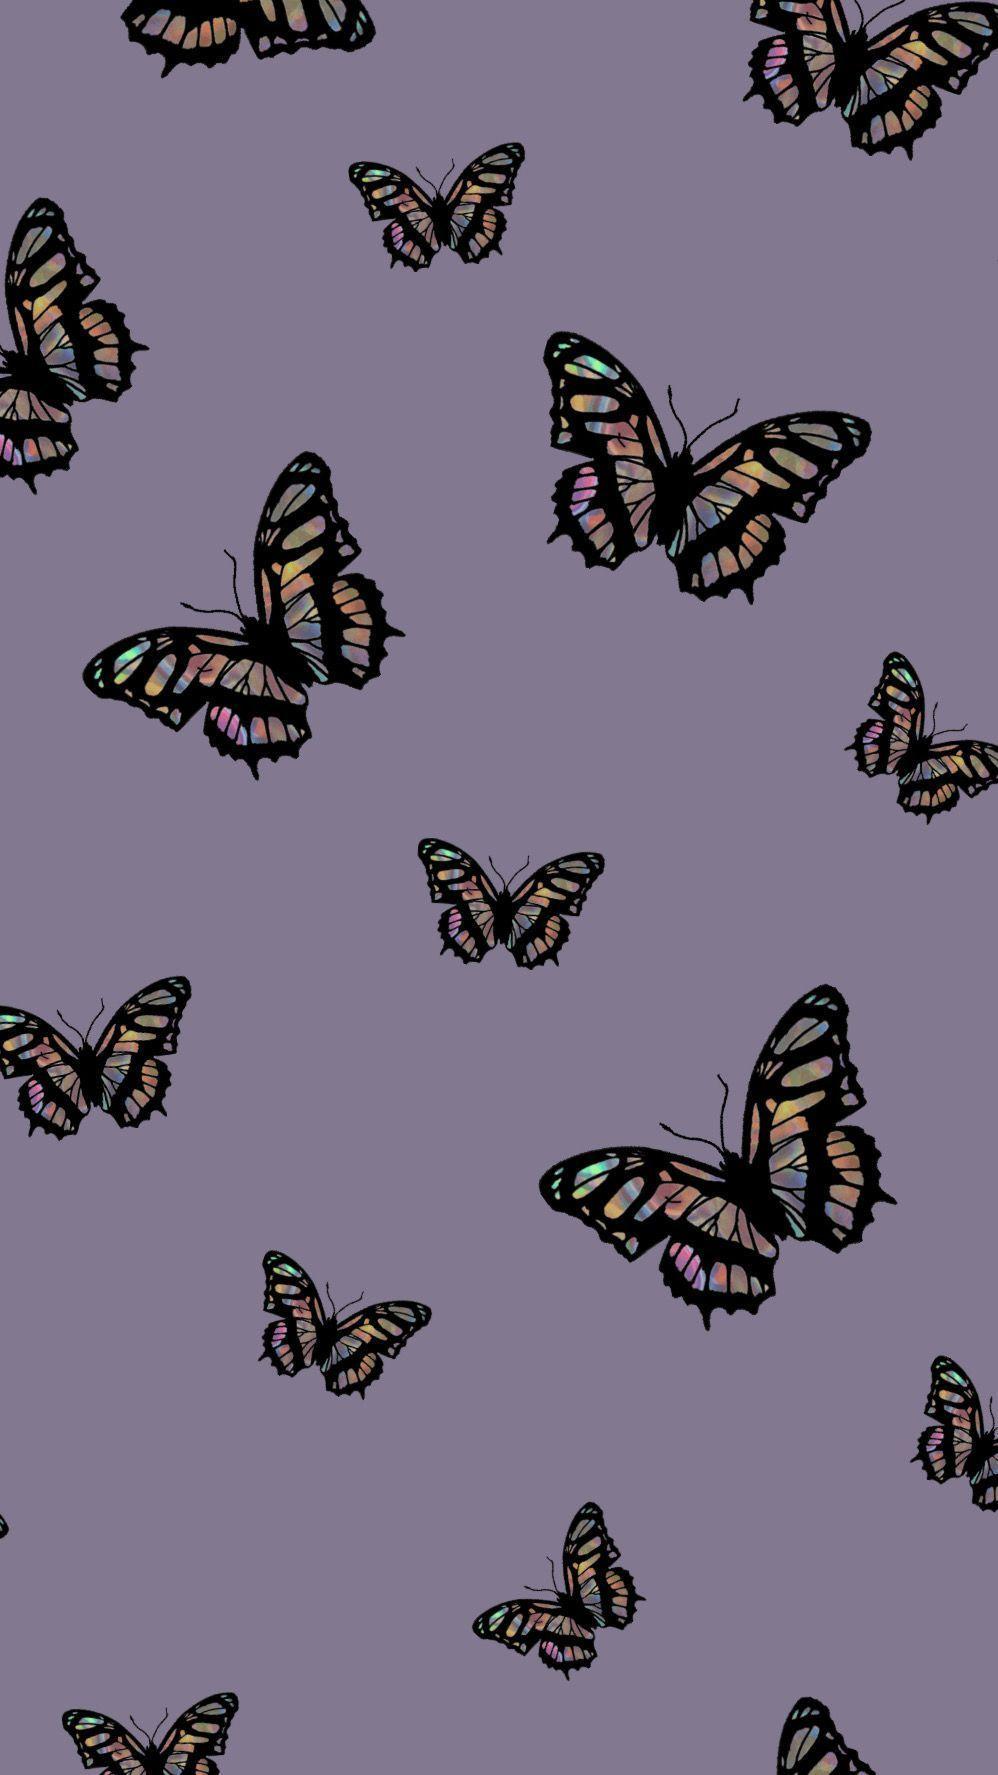 Farfalla Iphone Wallpaper Estetica Ipcwallpapers In 2020 Butterfly Wallpaper Iphone Art Wallpaper Iphone Trippy Wallpaper